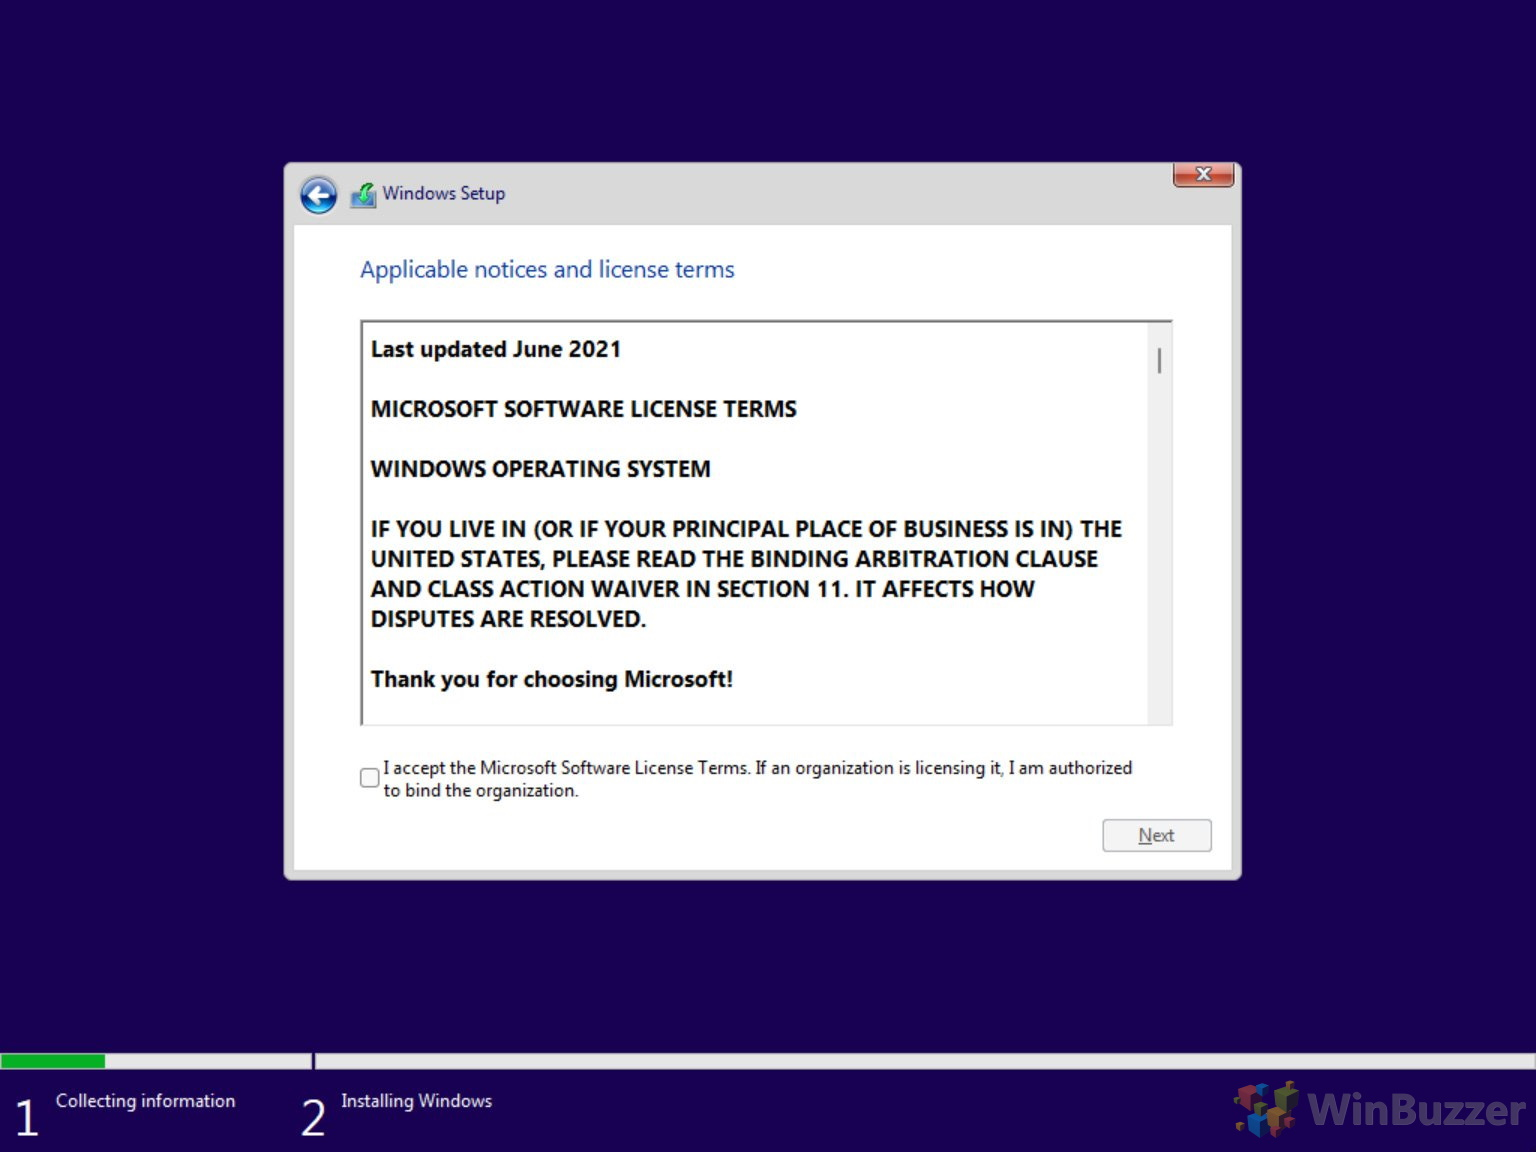 Windows 10 - Windows Setup - Continue